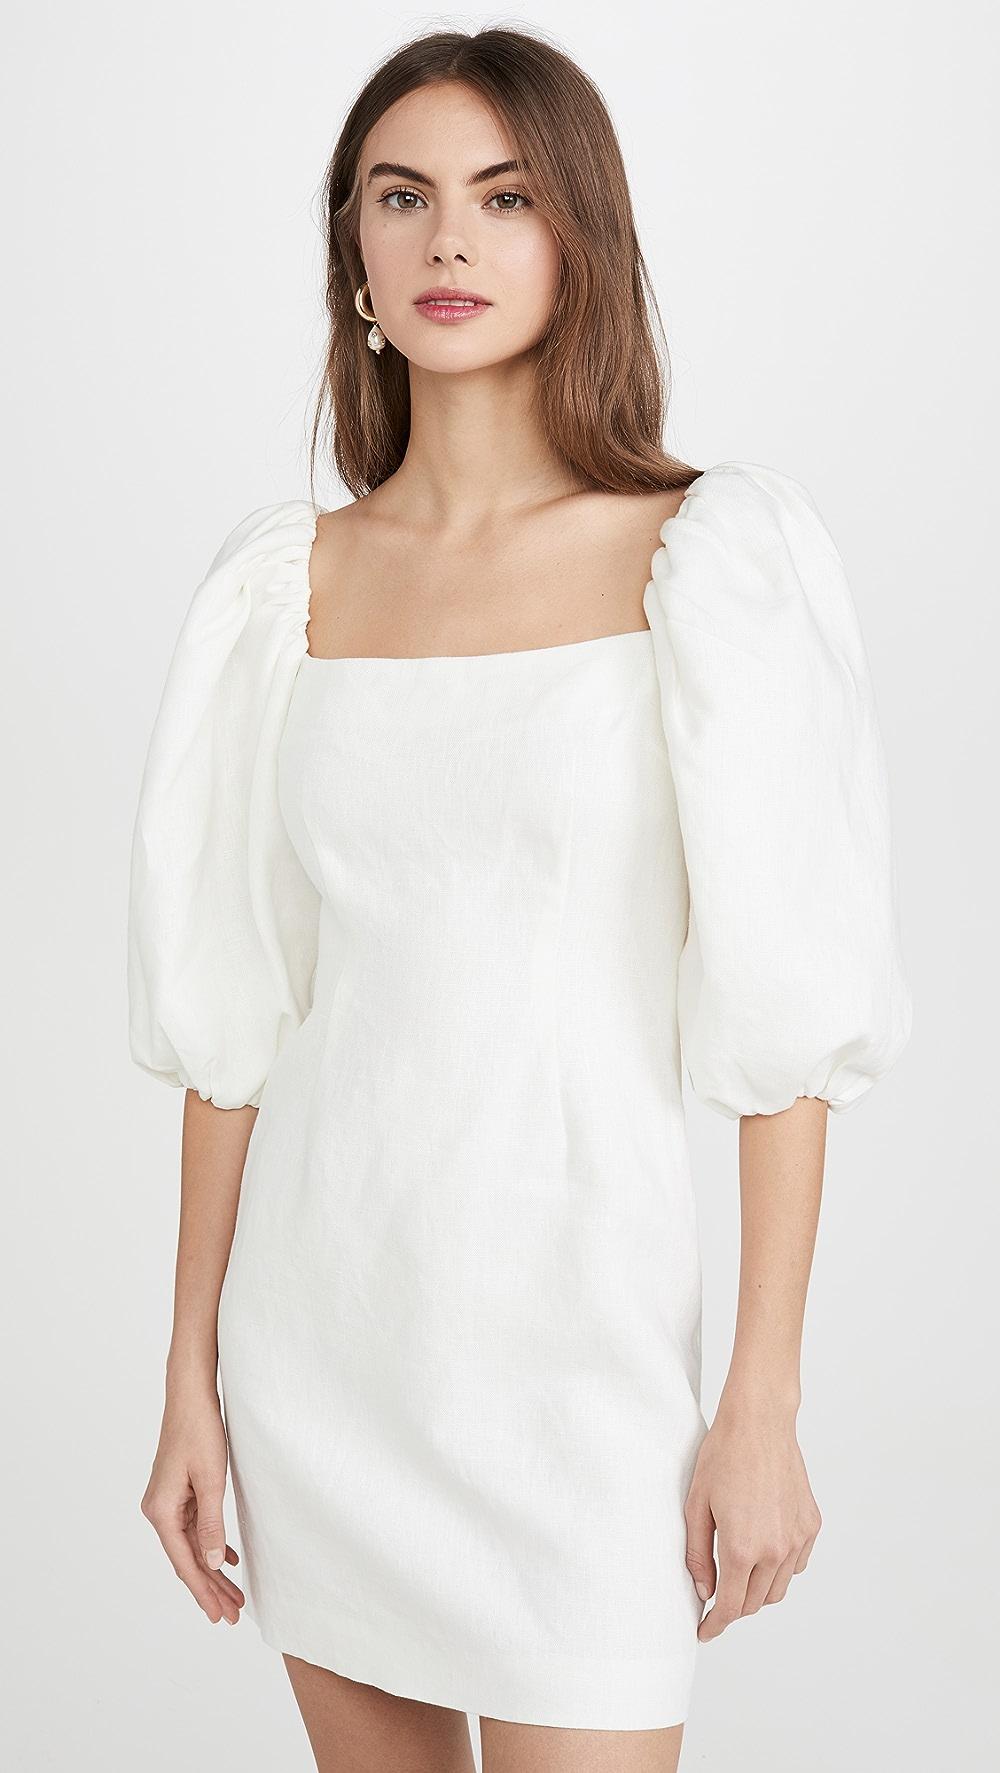 Honest Rebecca De Ravenel - First Impression Mini Dress Perfect In Workmanship